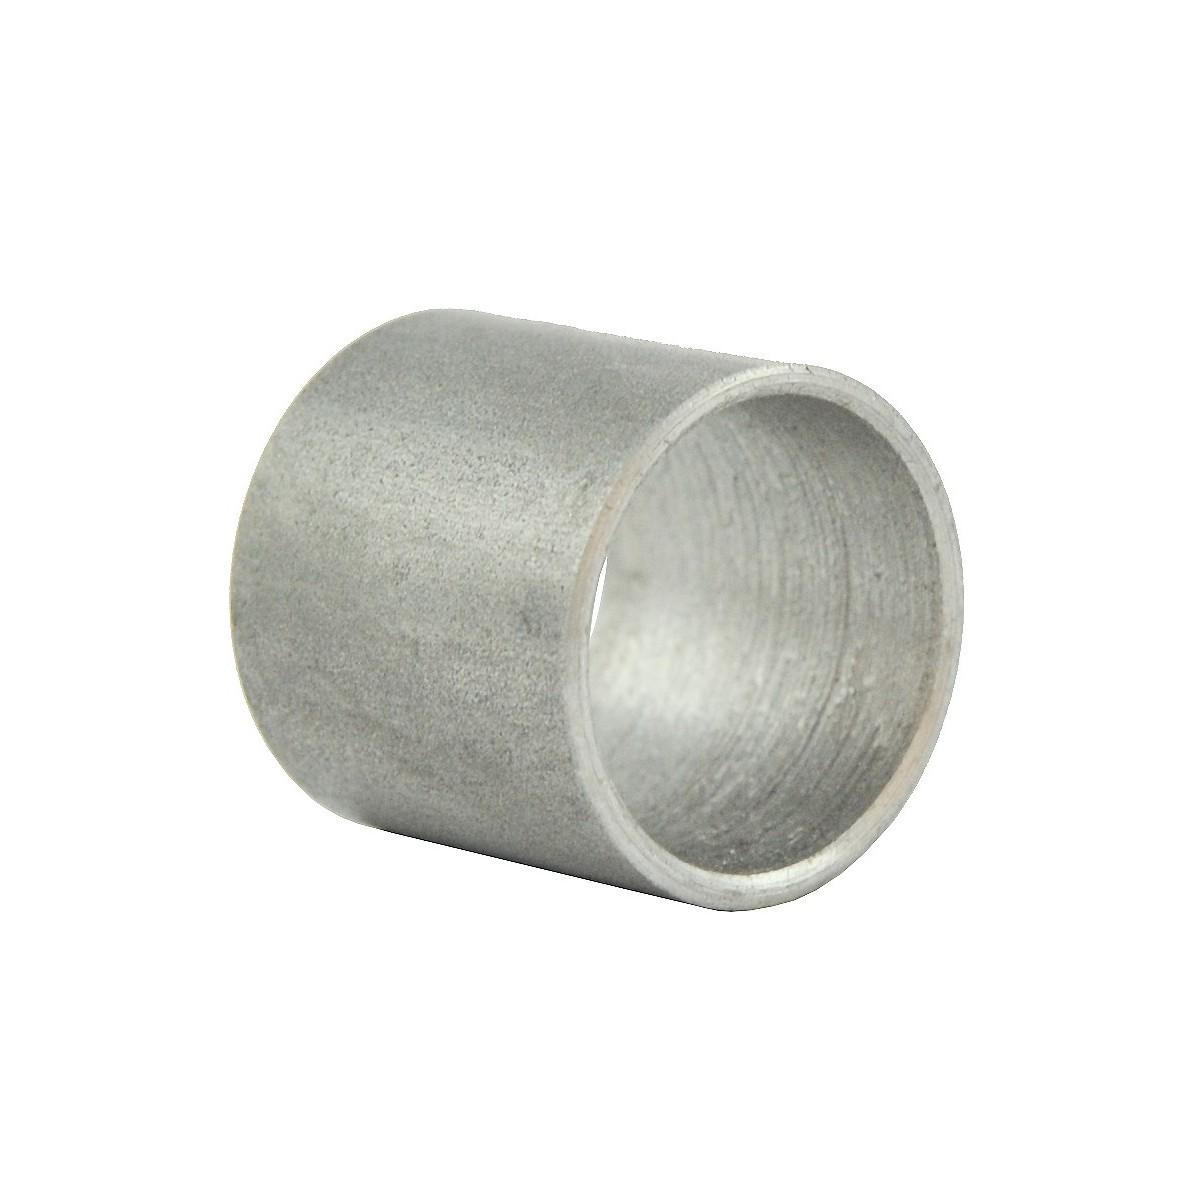 Sleeve bushing 22x25x25 mm Yanmar YM1300 ring